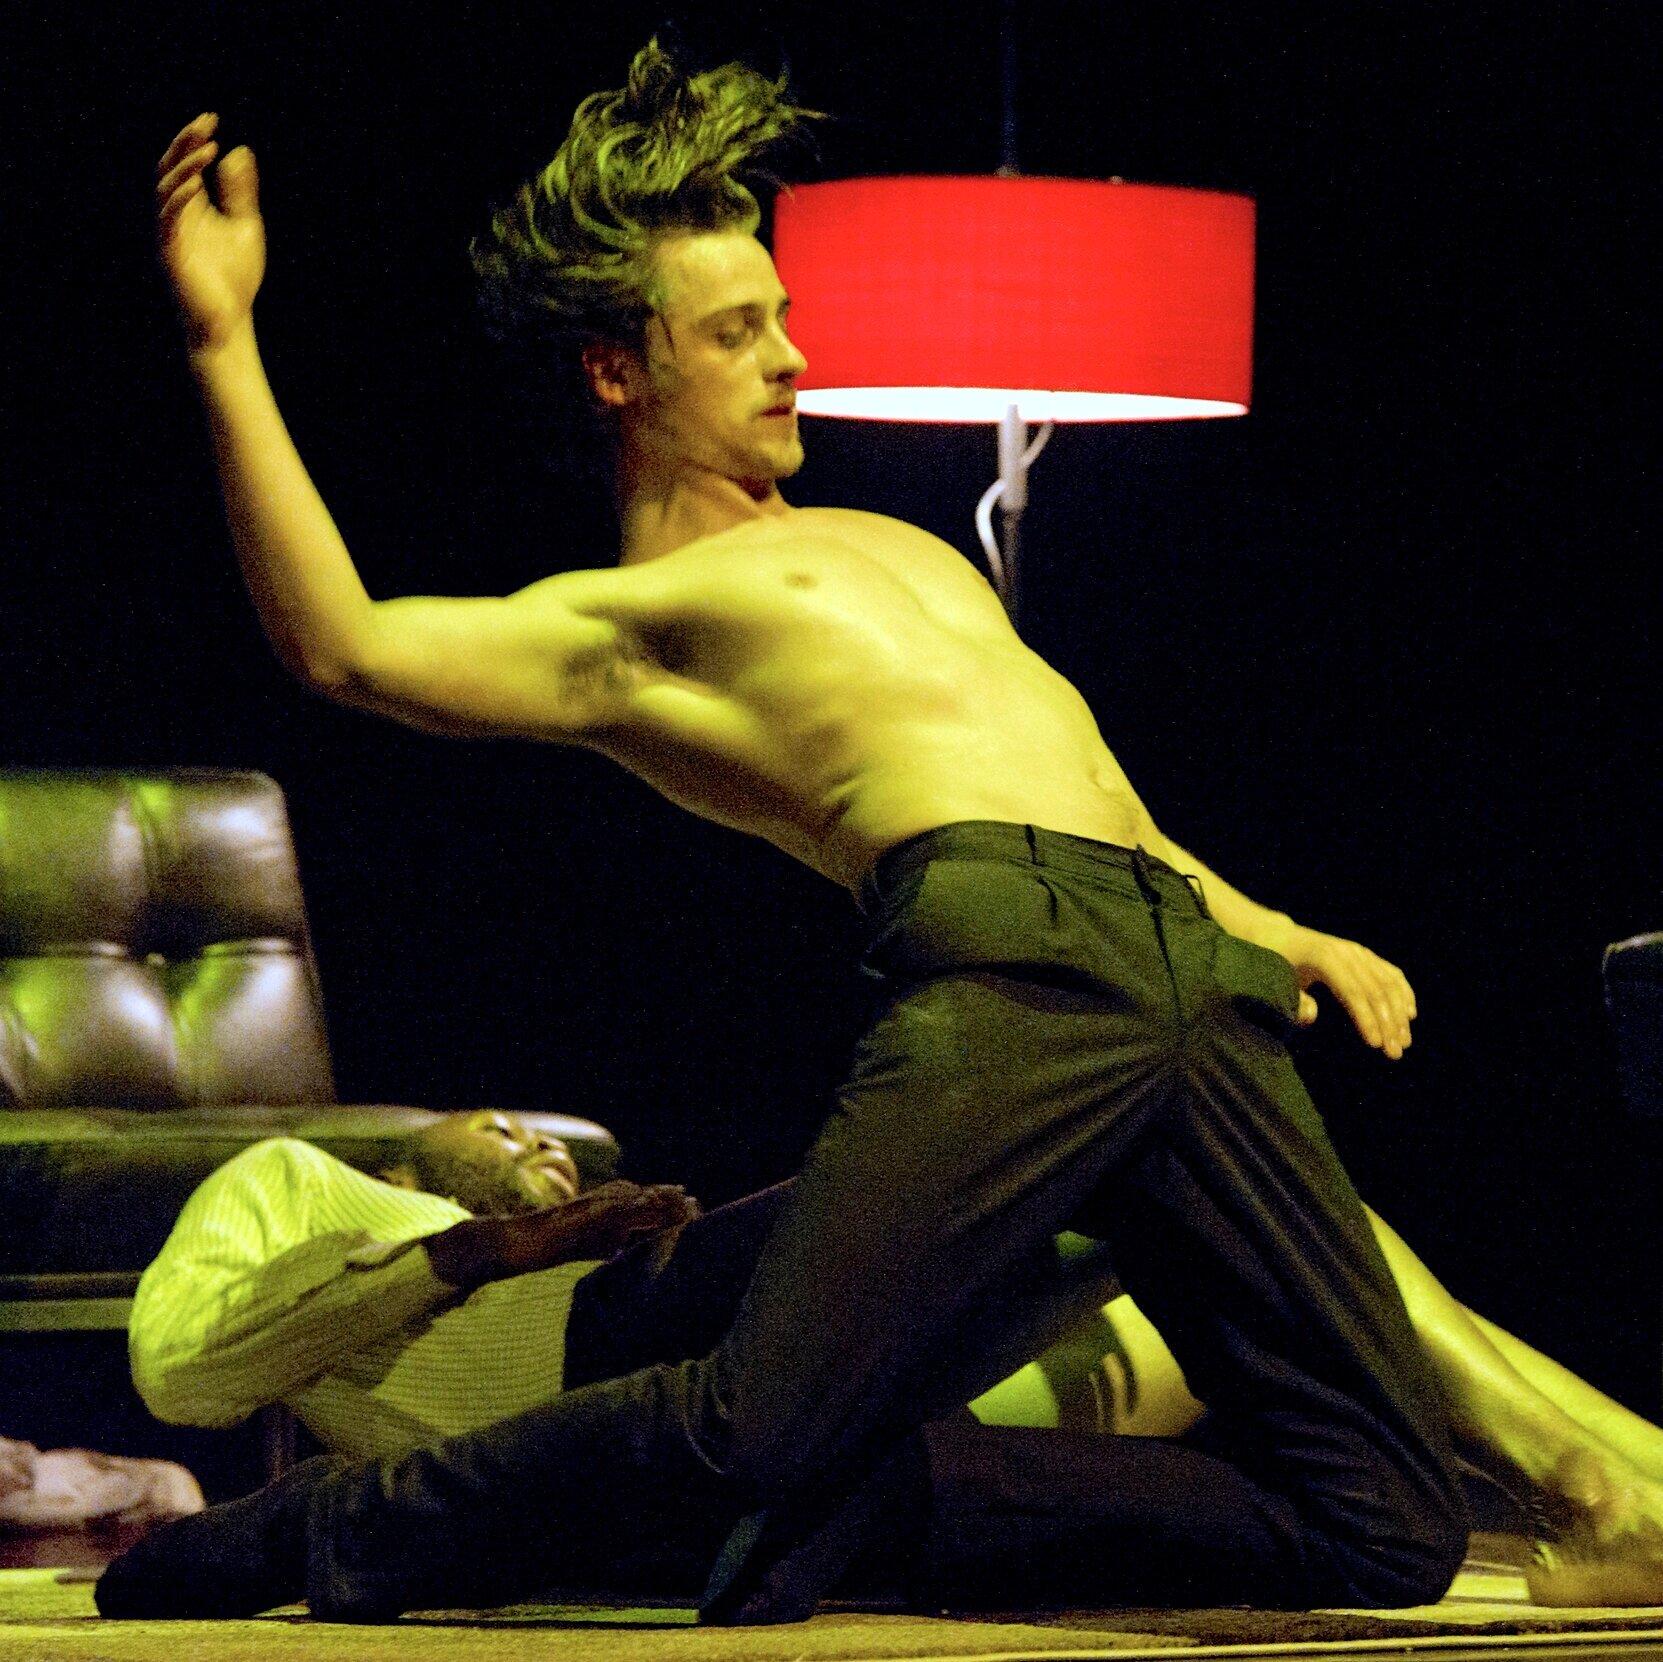 Milan+Nowoitnick+Kampfer_Blowed+Irritated+Man_Konzert+Theater+Bern_credits+Philipp+Zinniker.jpg